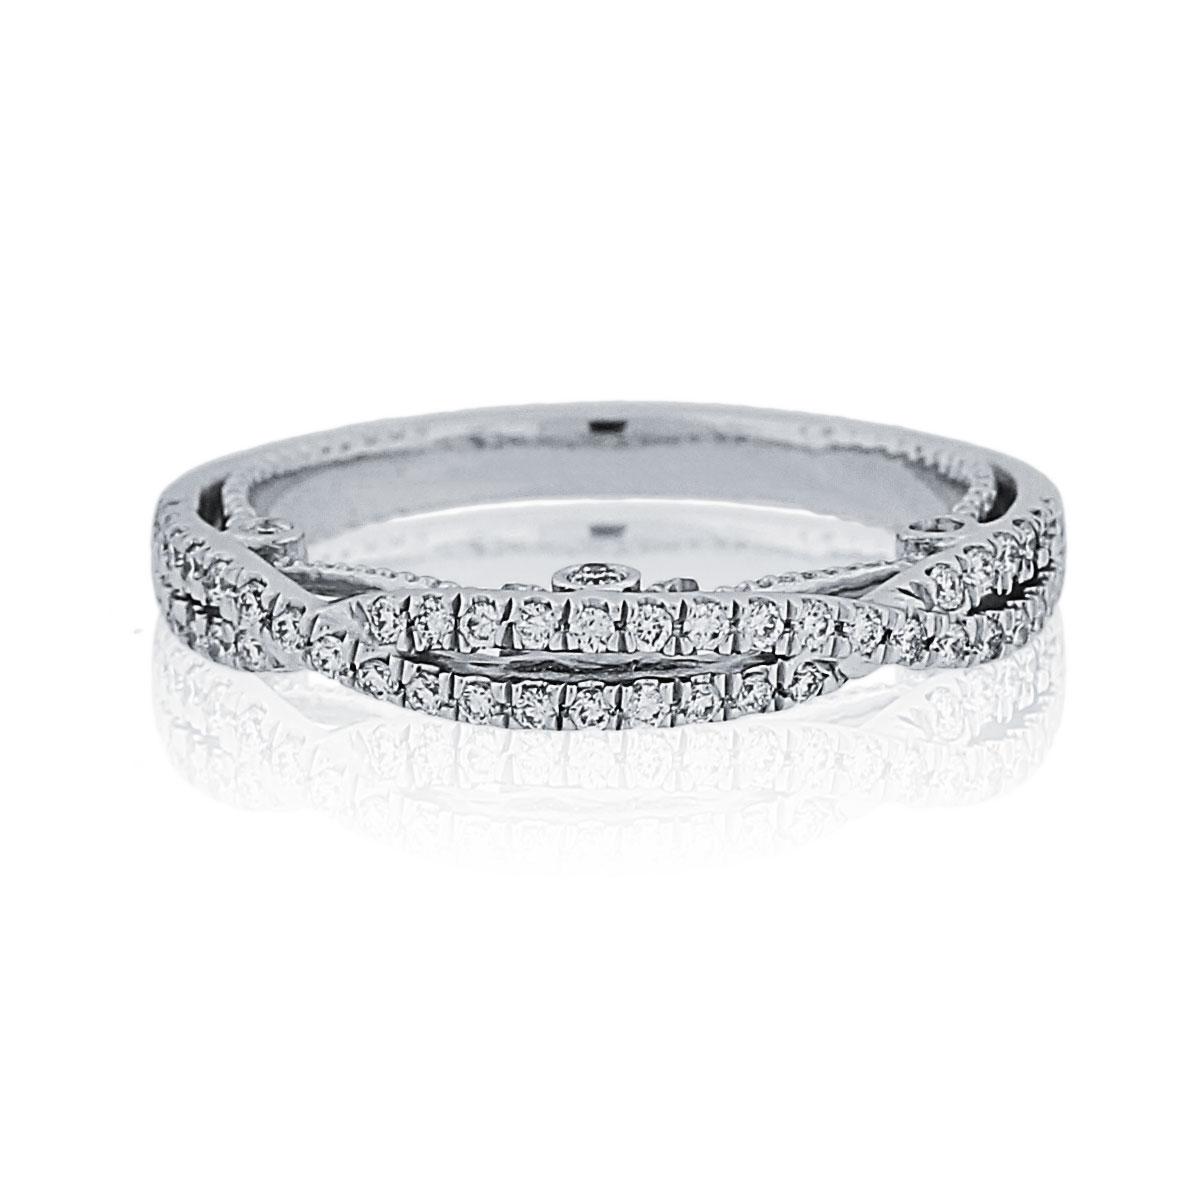 Verragio Engagement Rings Gold Diamond Wedding Band 0 10ctw